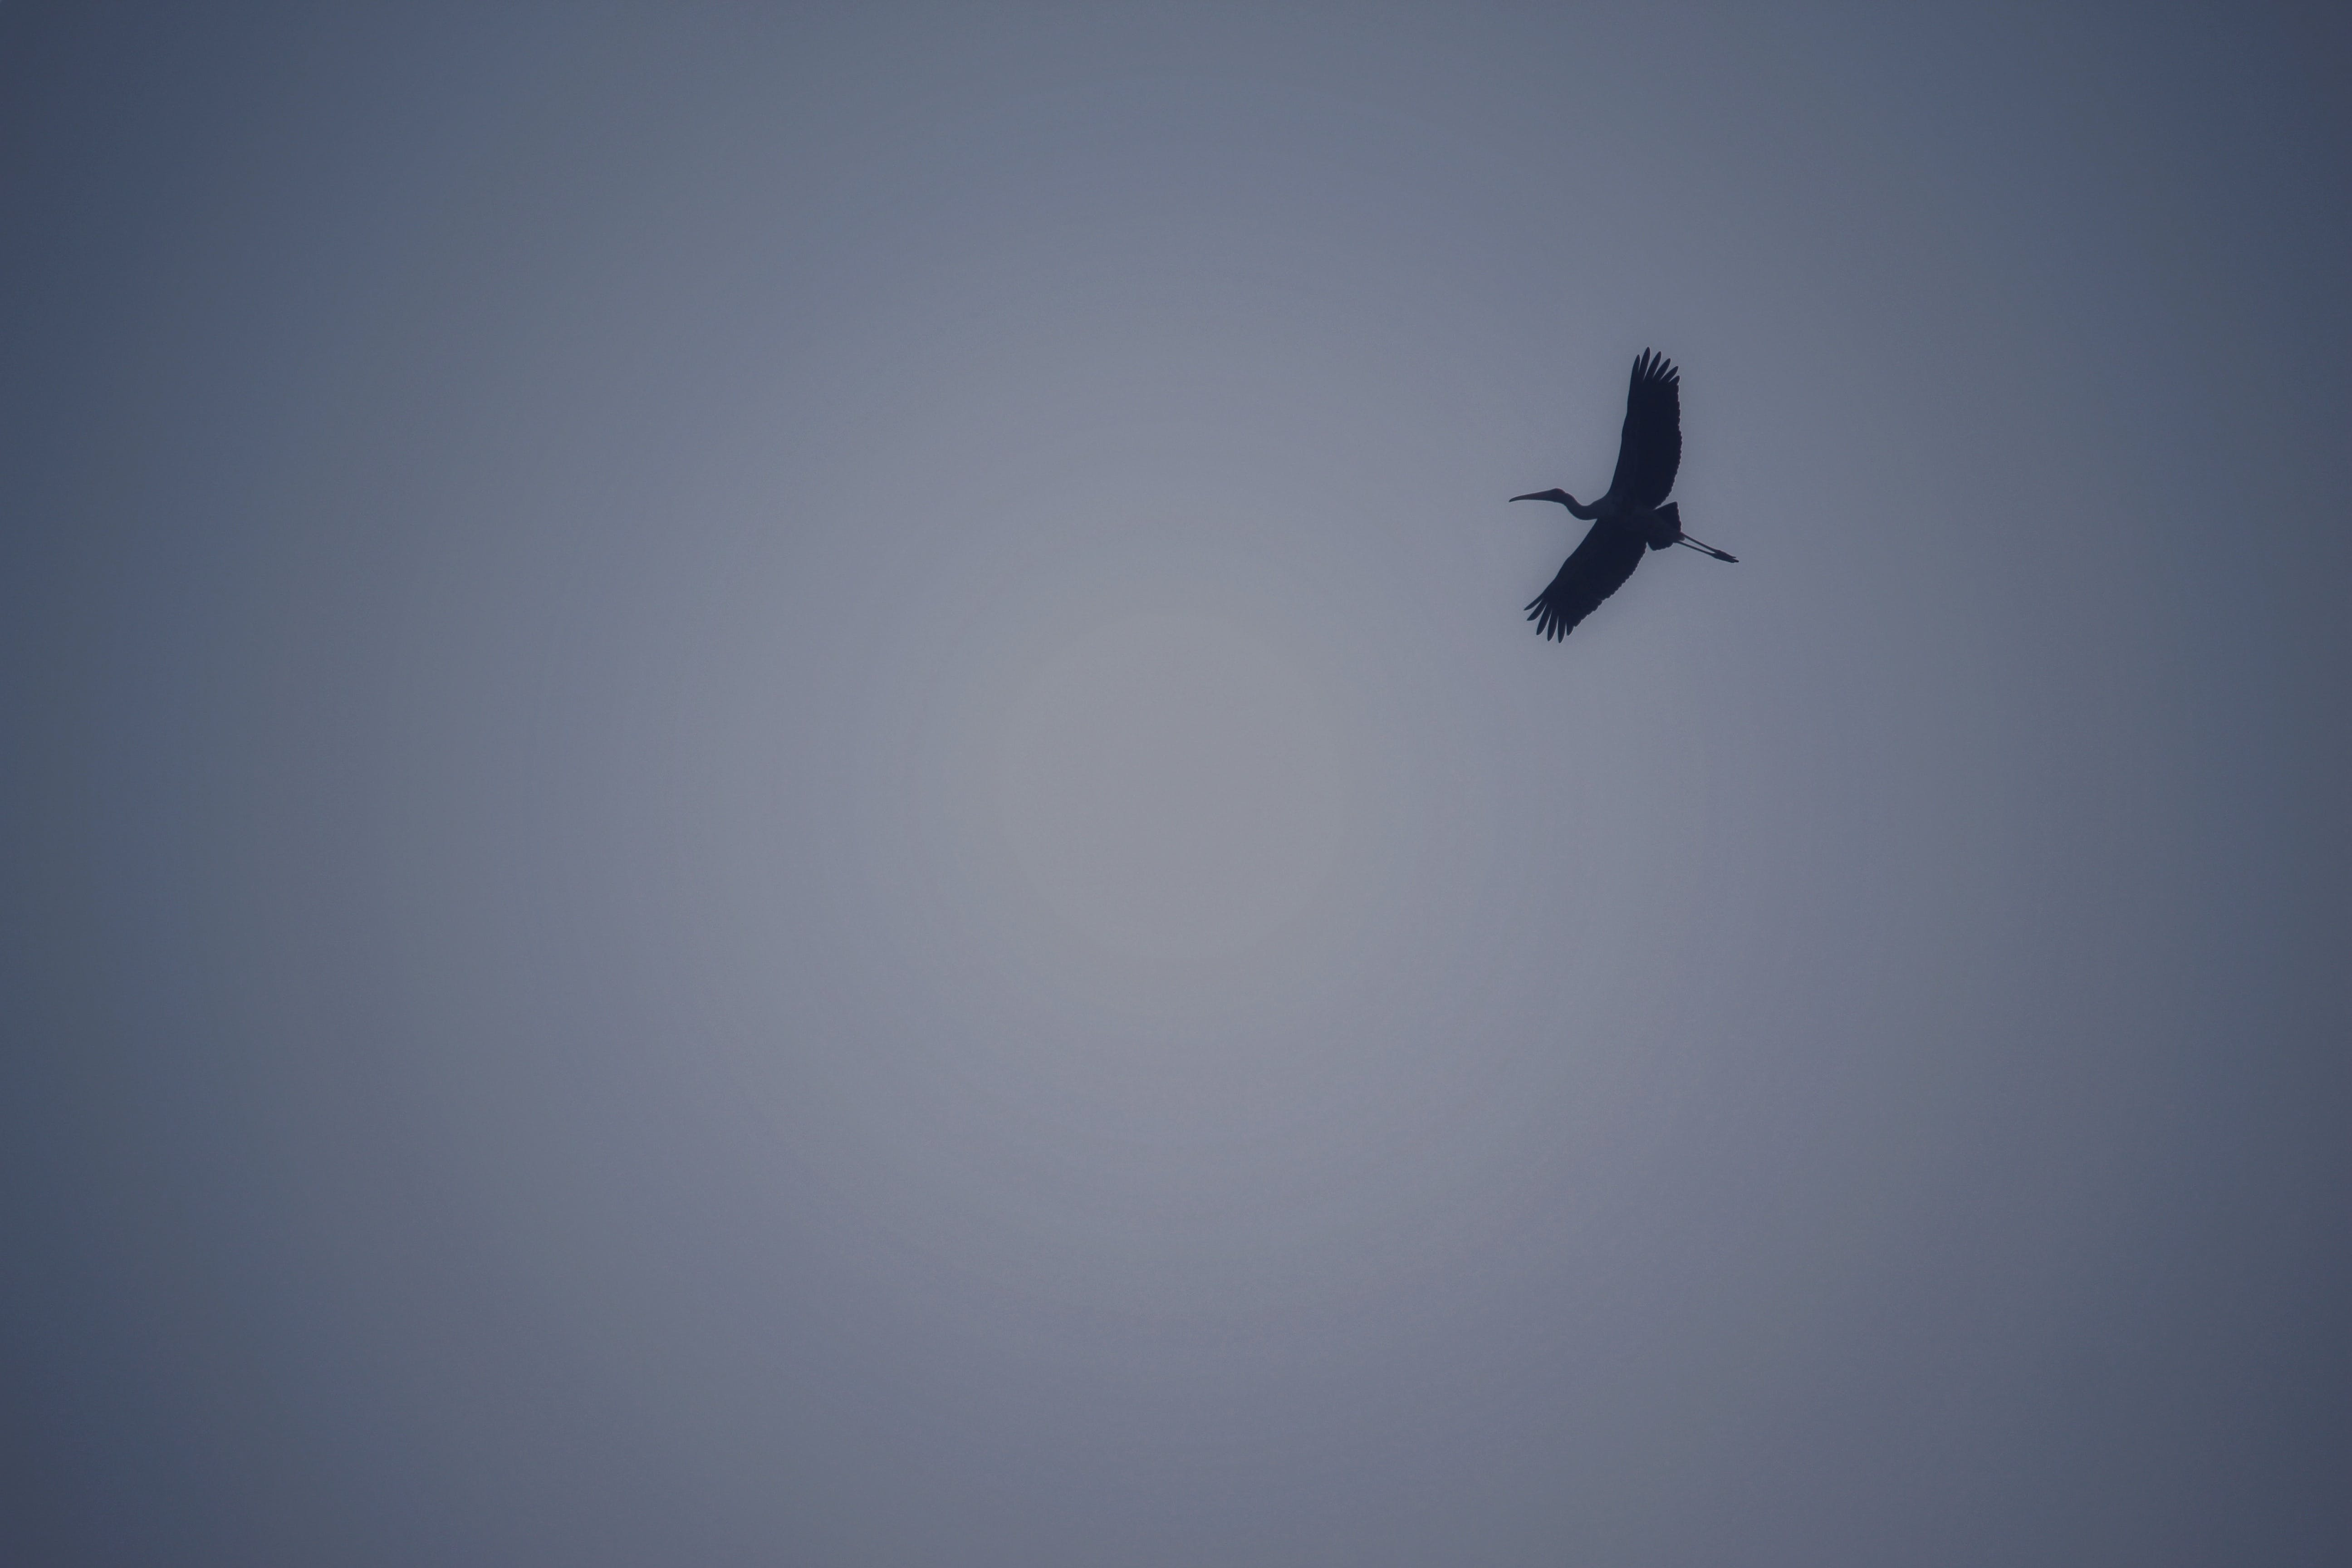 Kostnadsfri bild av bakgrundsbelyst, dagsljus, djur, flygande